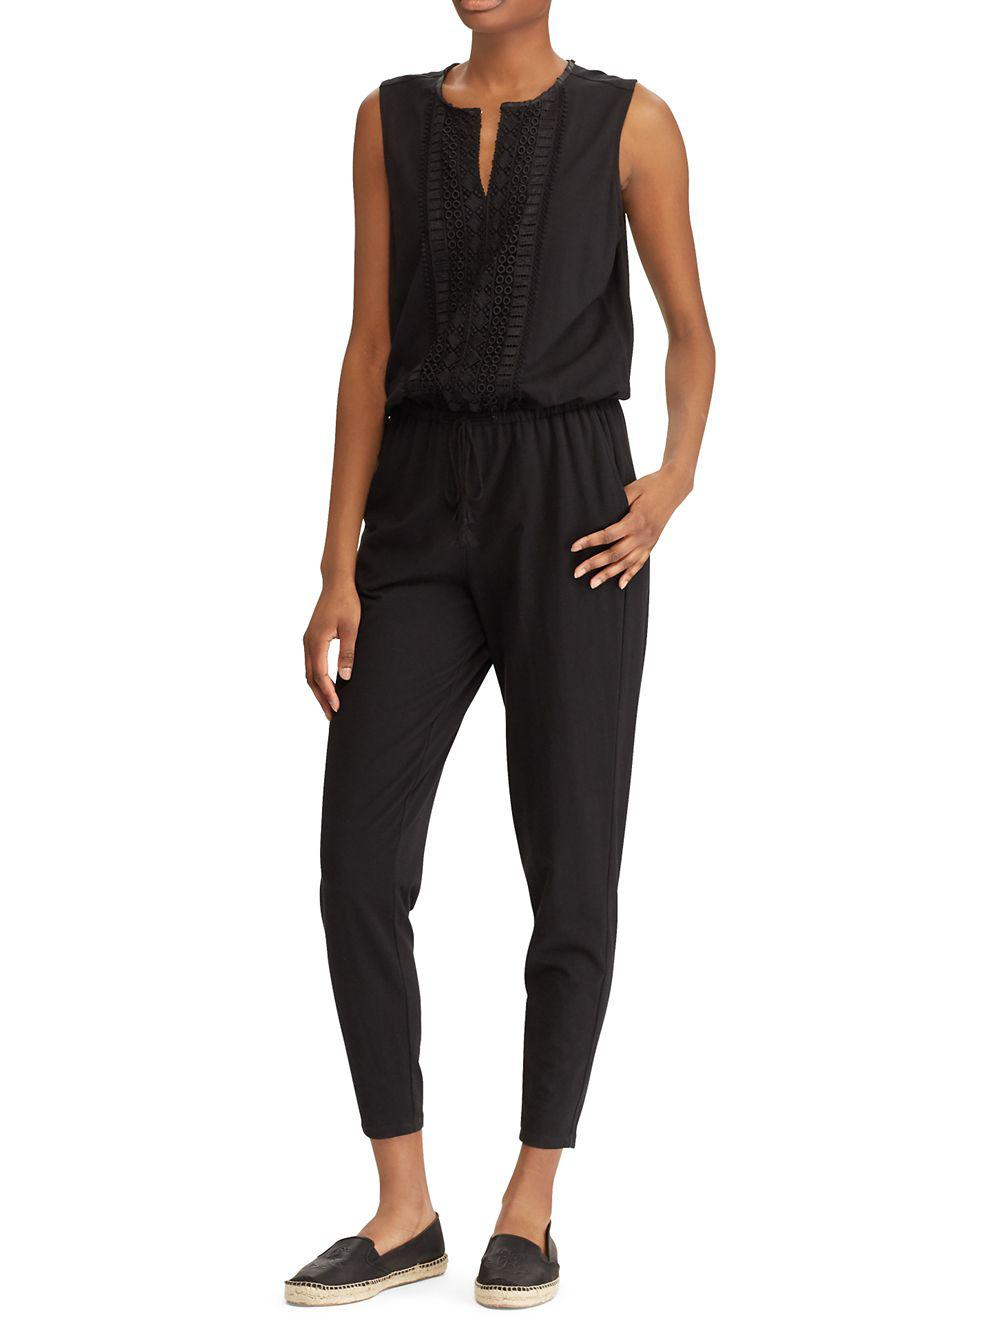 f28d7a79c98 Lyst - Lauren By Ralph Lauren Skinny Jersey Jumpsuit in Black